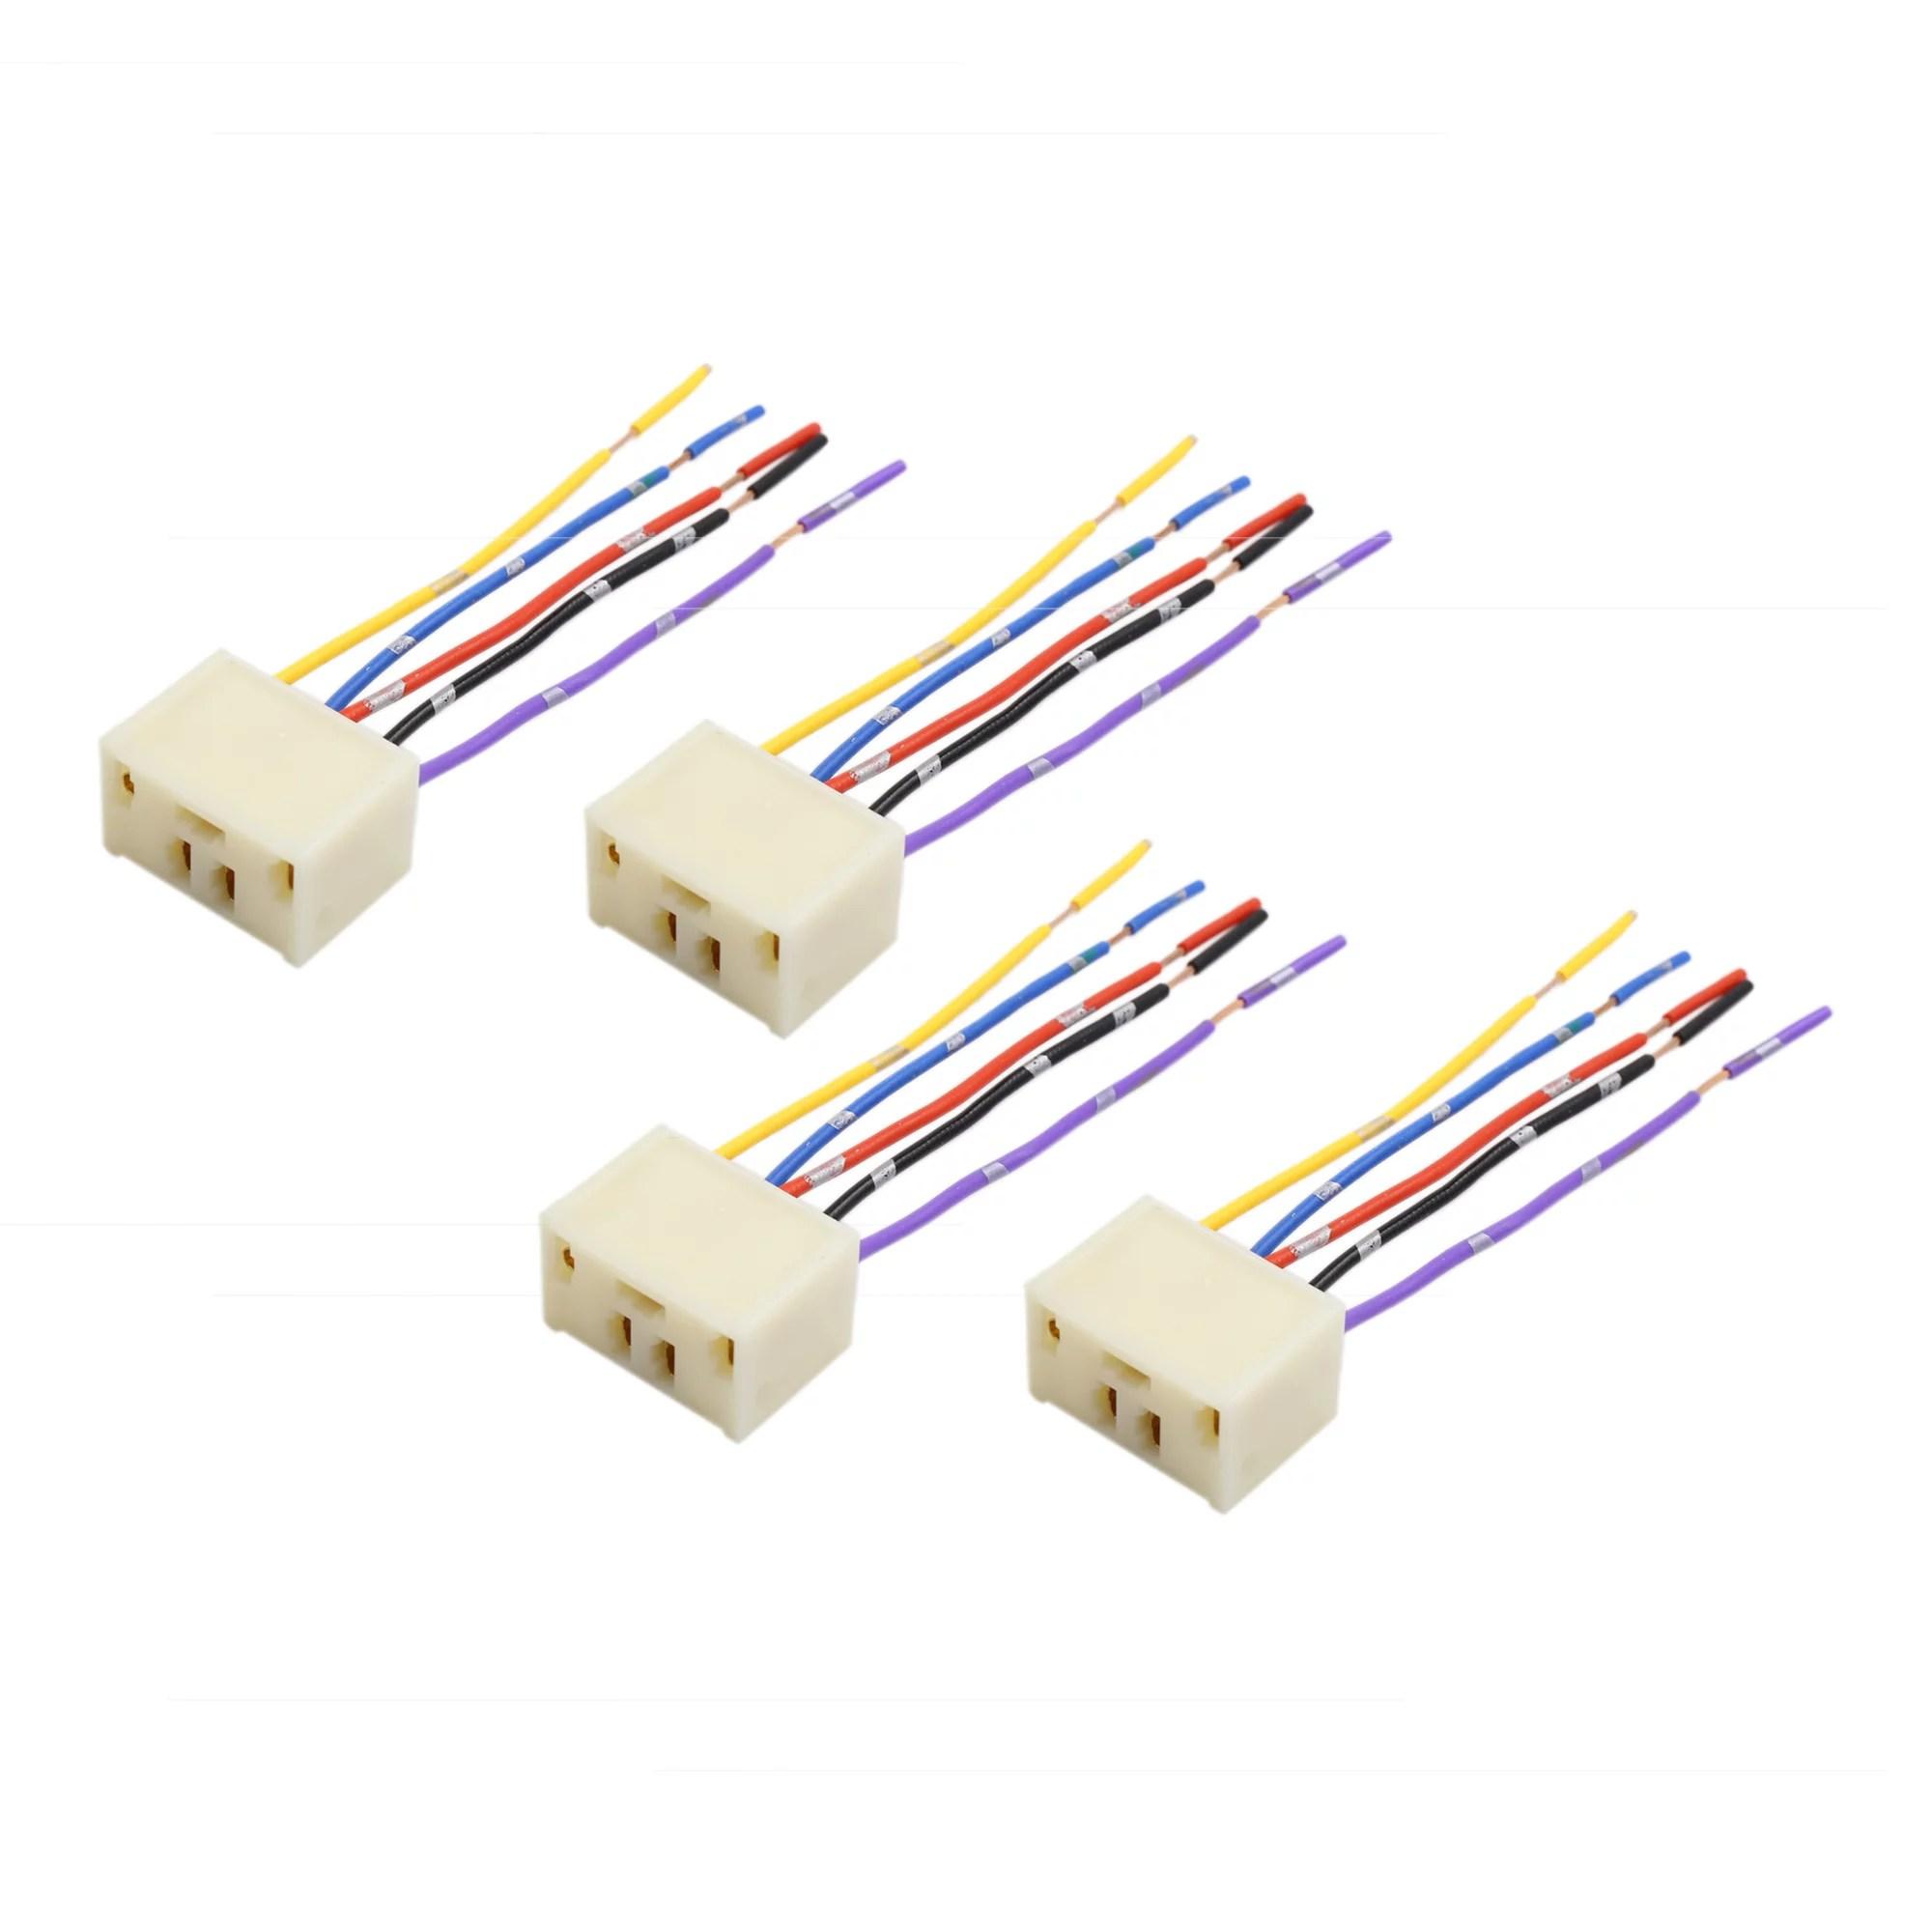 4pcs dc 12v 5 pin car power window switch socket wiring harness plug adapter walmart canada  [ 2000 x 2000 Pixel ]